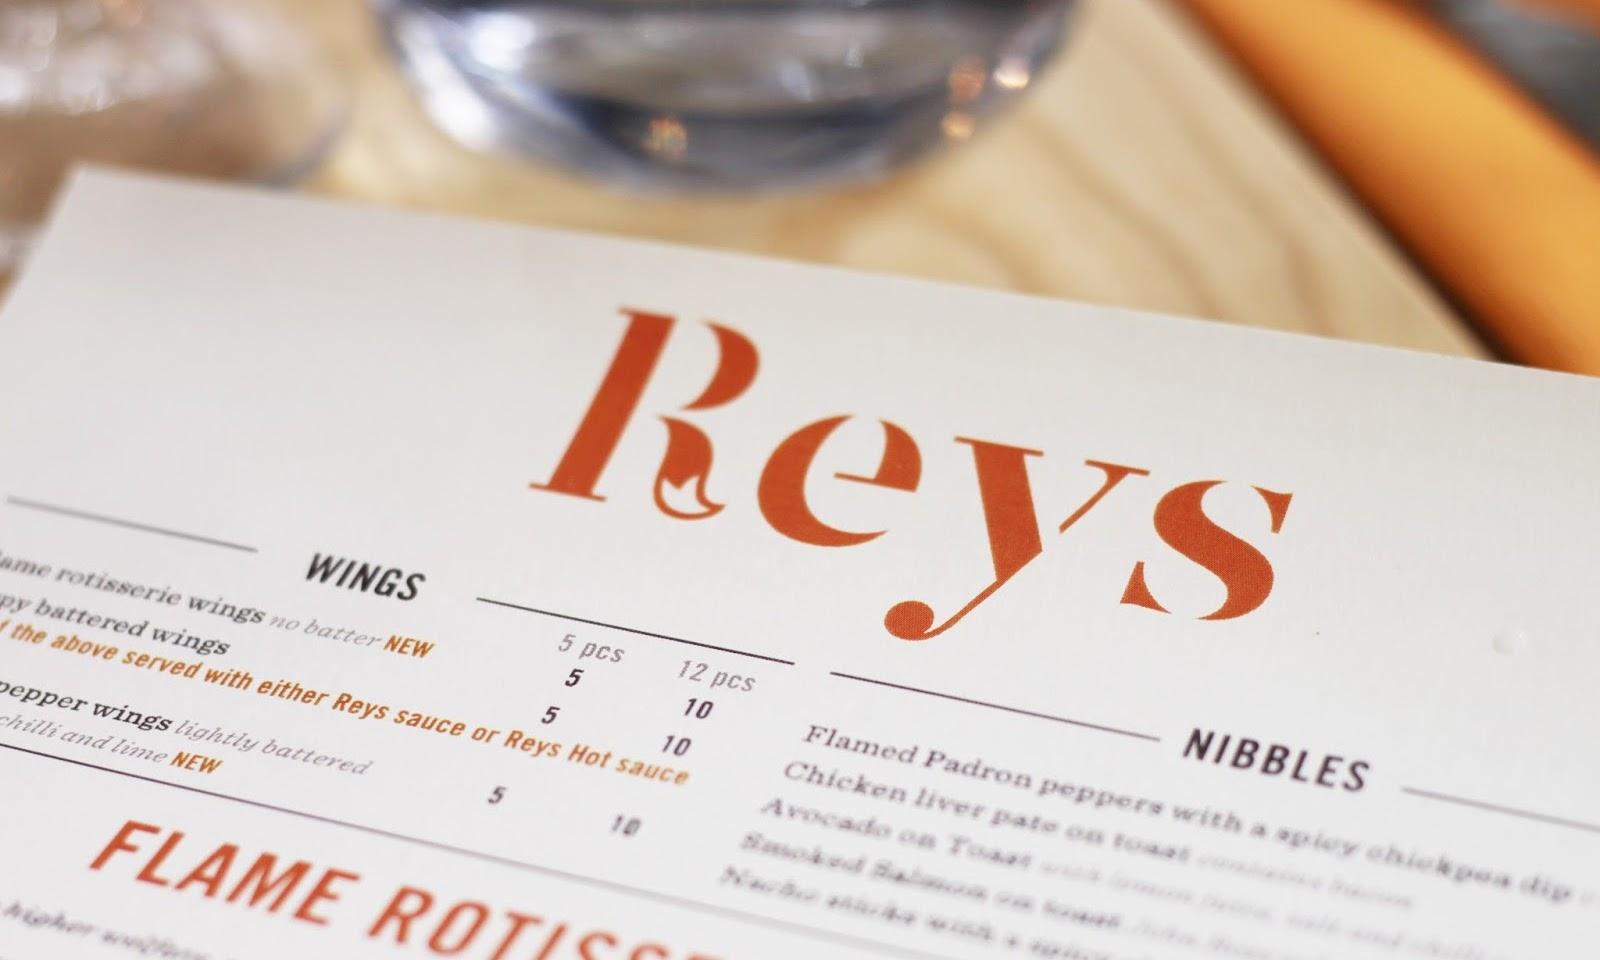 Clashing Time eats: Reys Chicken